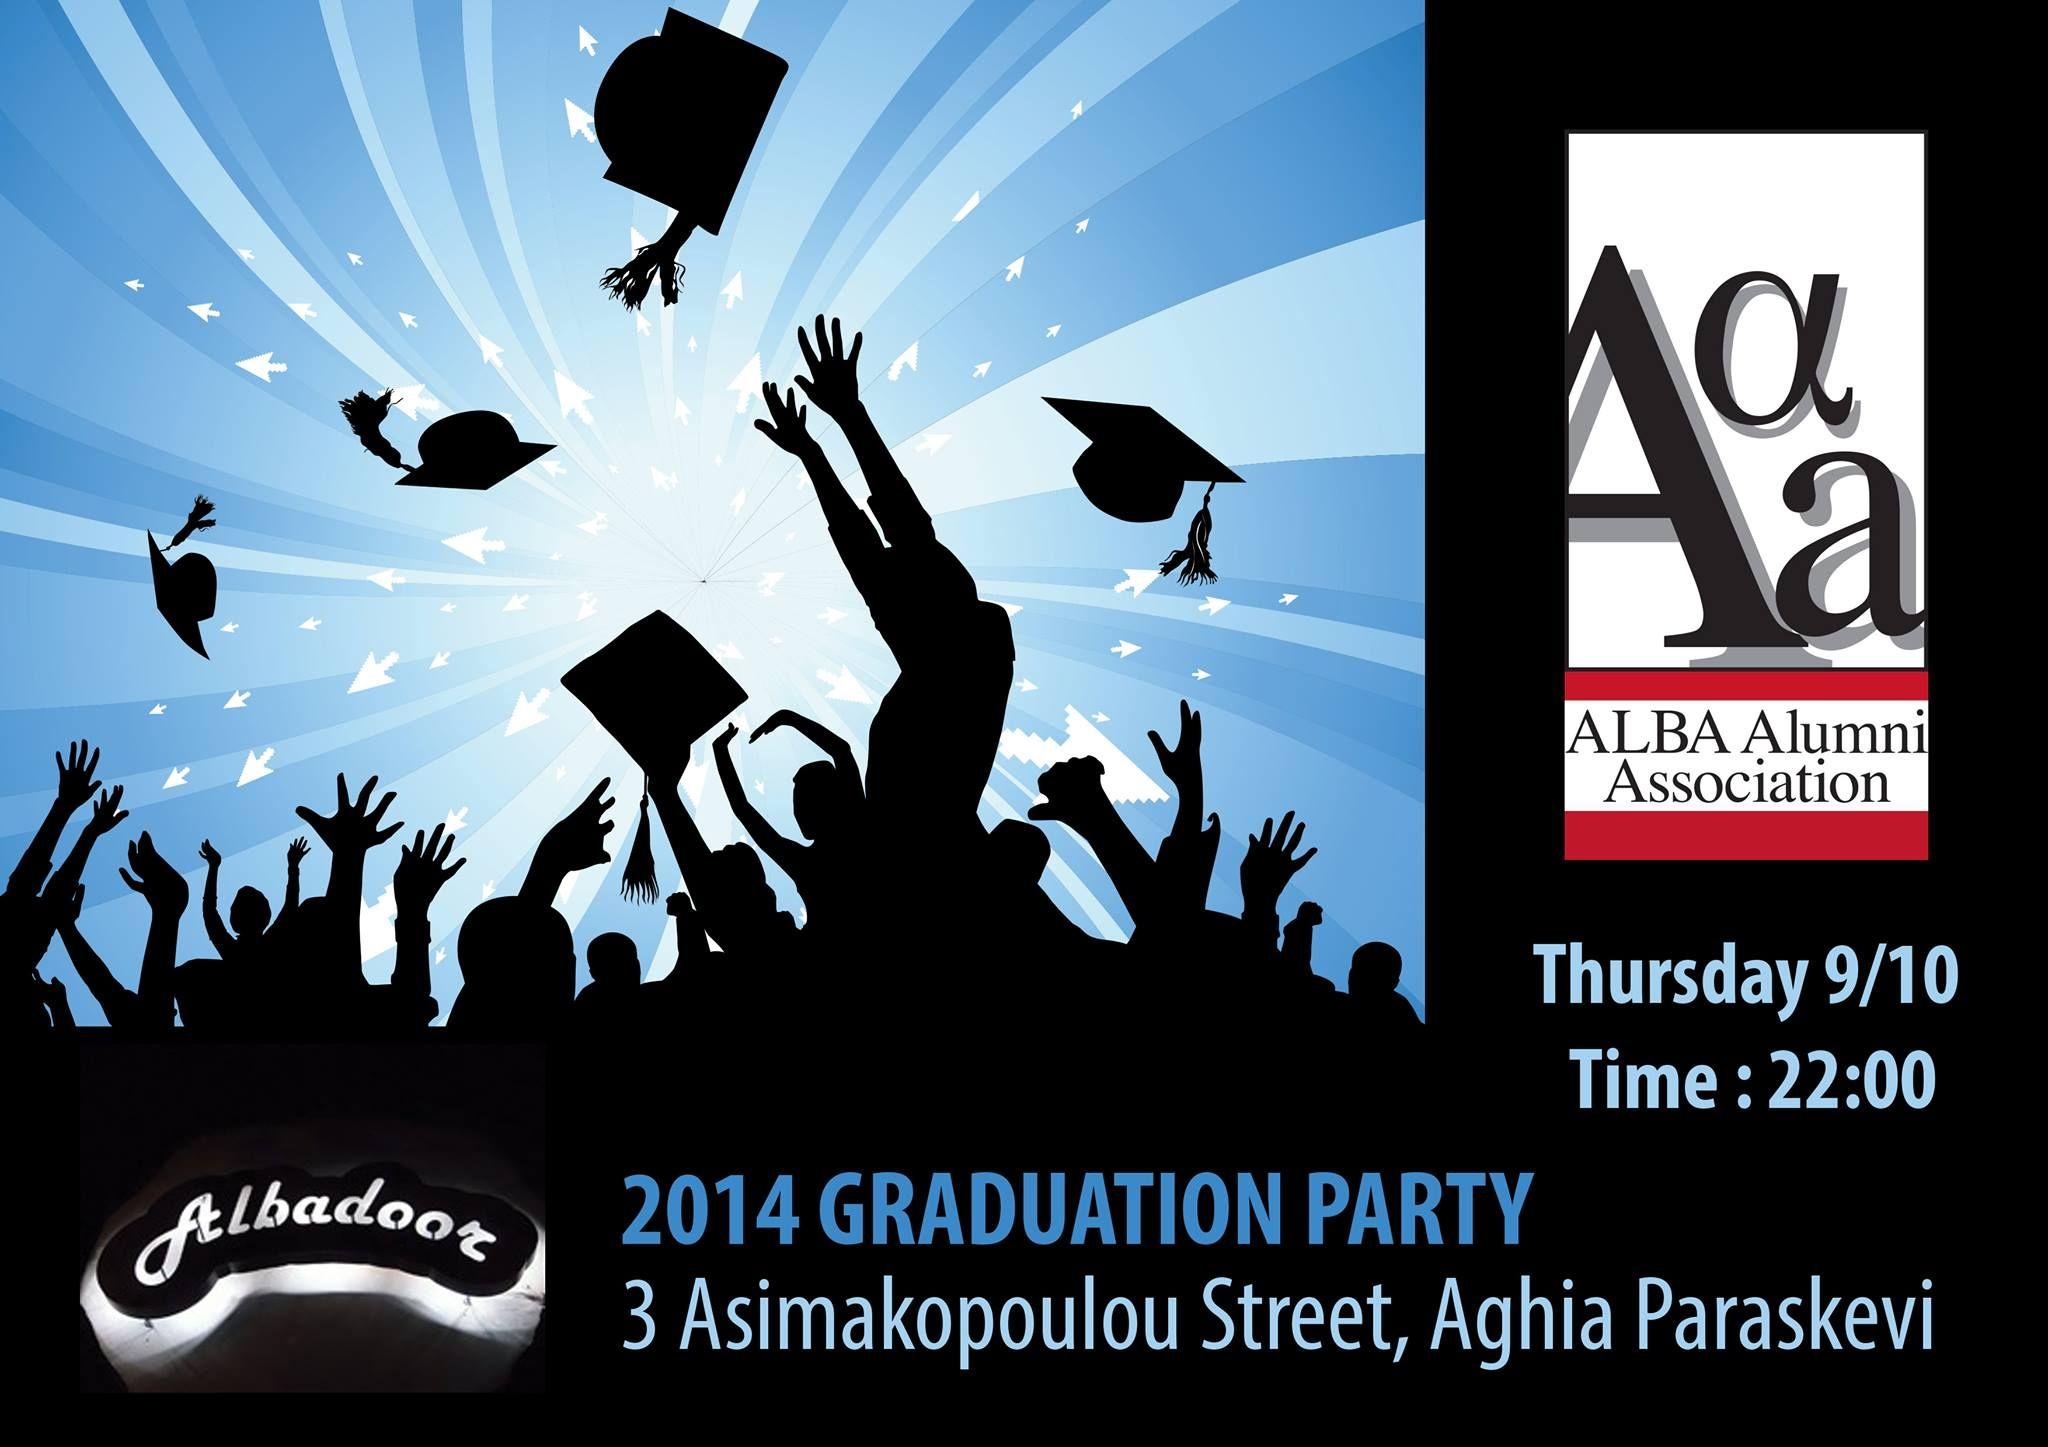 AAA - 2014 GRADUATION PARTY